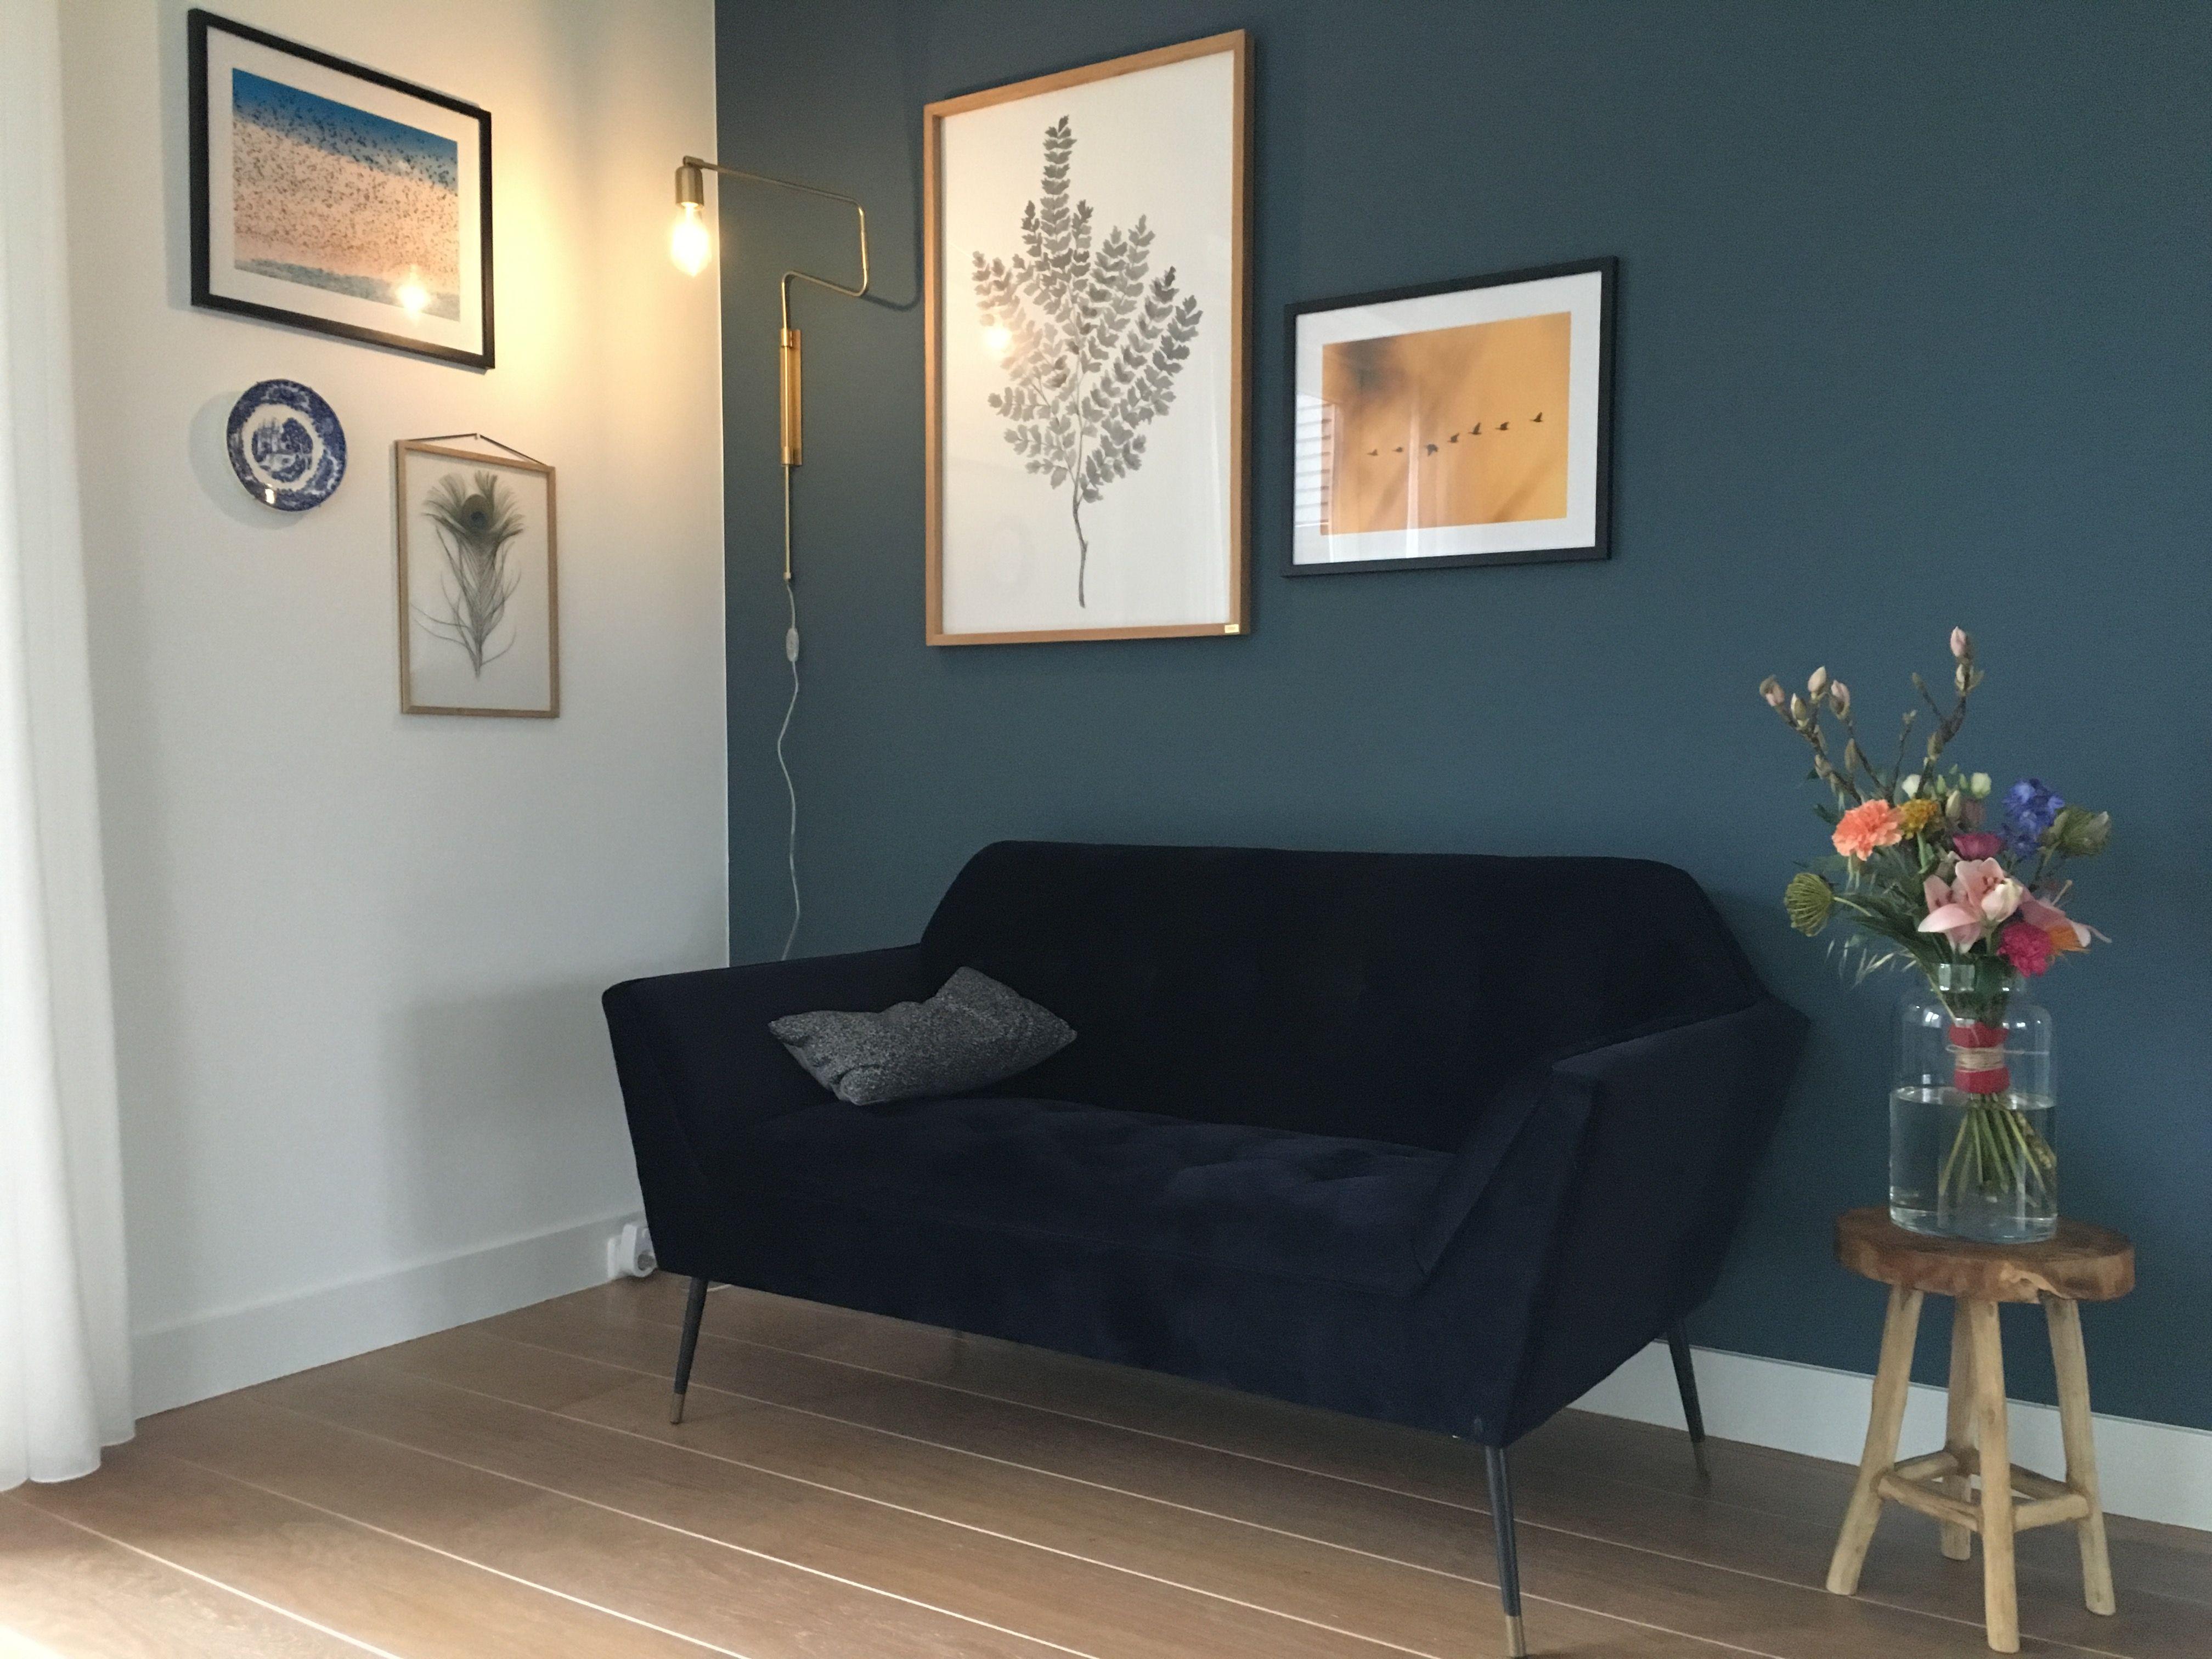 Woonkamer idee met bankje van dutchbone en flexa kleur faded indigo